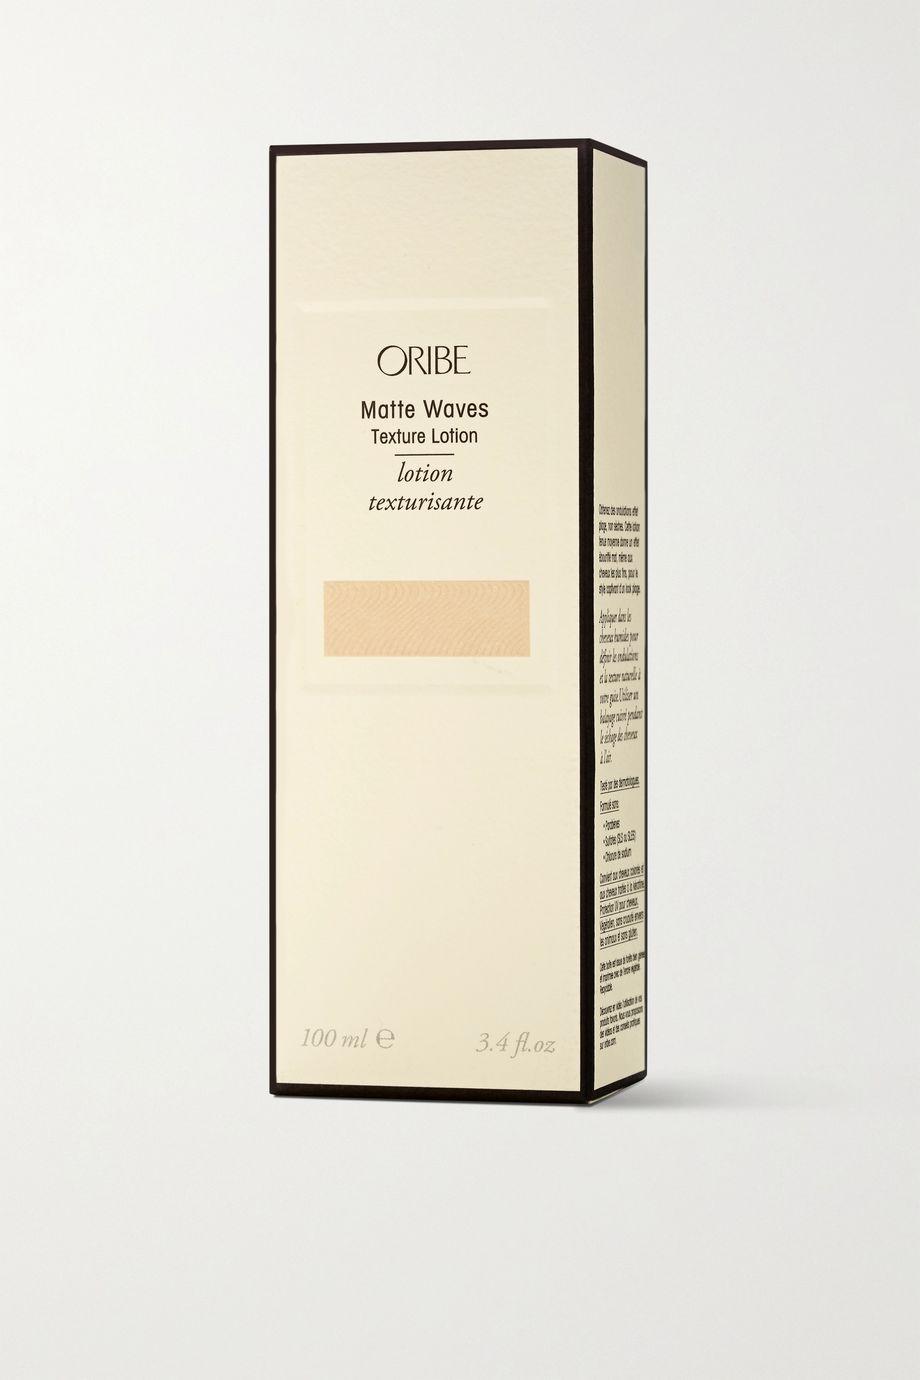 Oribe Matte Waves Texture Lotion, 100ml